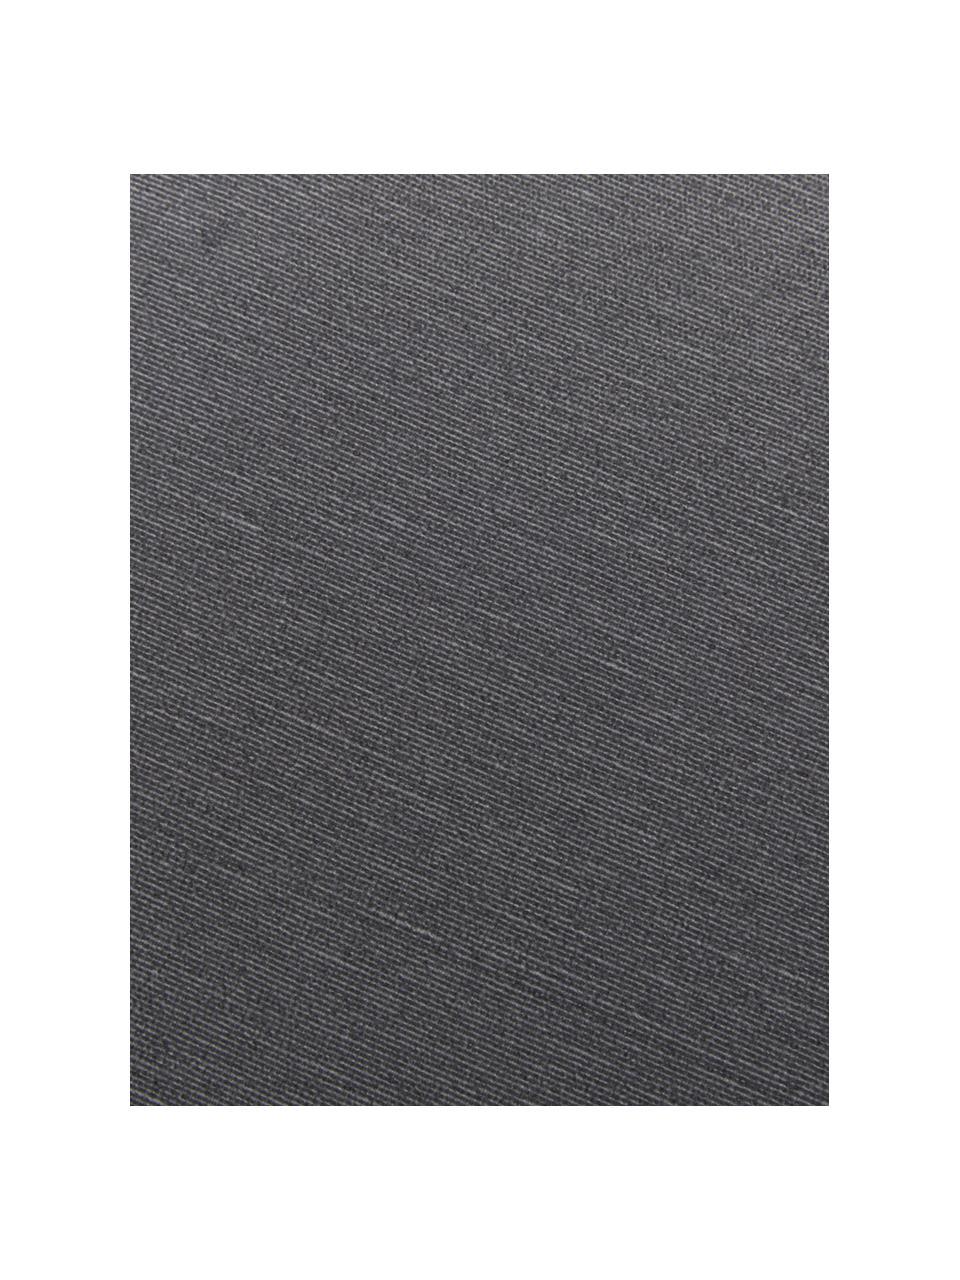 Einfarbige Bankauflage Panama in Anthrazit, Bezug: 50% Baumwolle, 45% Polyes, Anthrazit, 48 x 120 cm